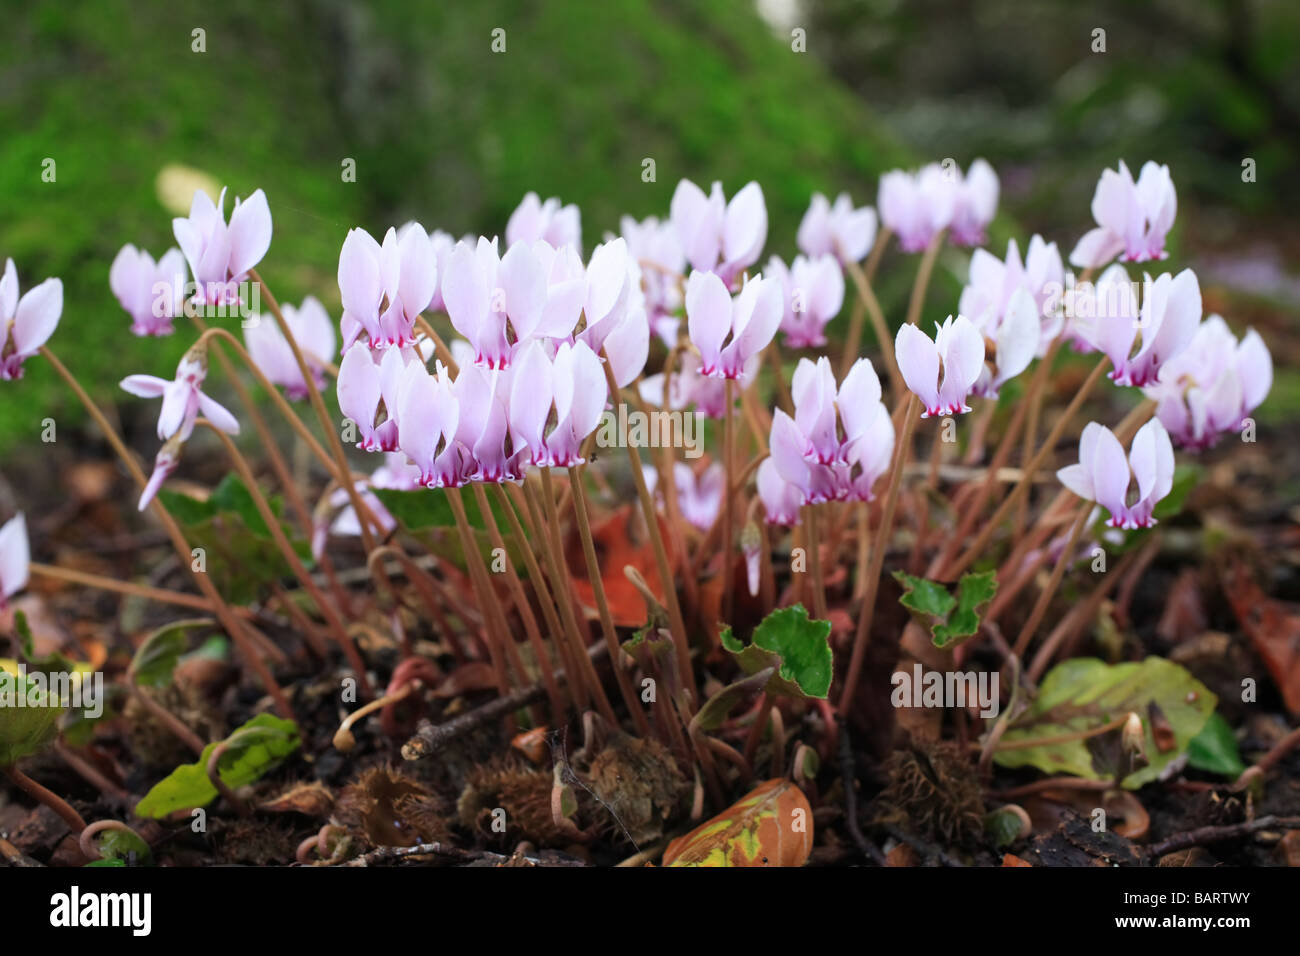 'Cyclamen hederifolium' woodland flowers - Stock Image